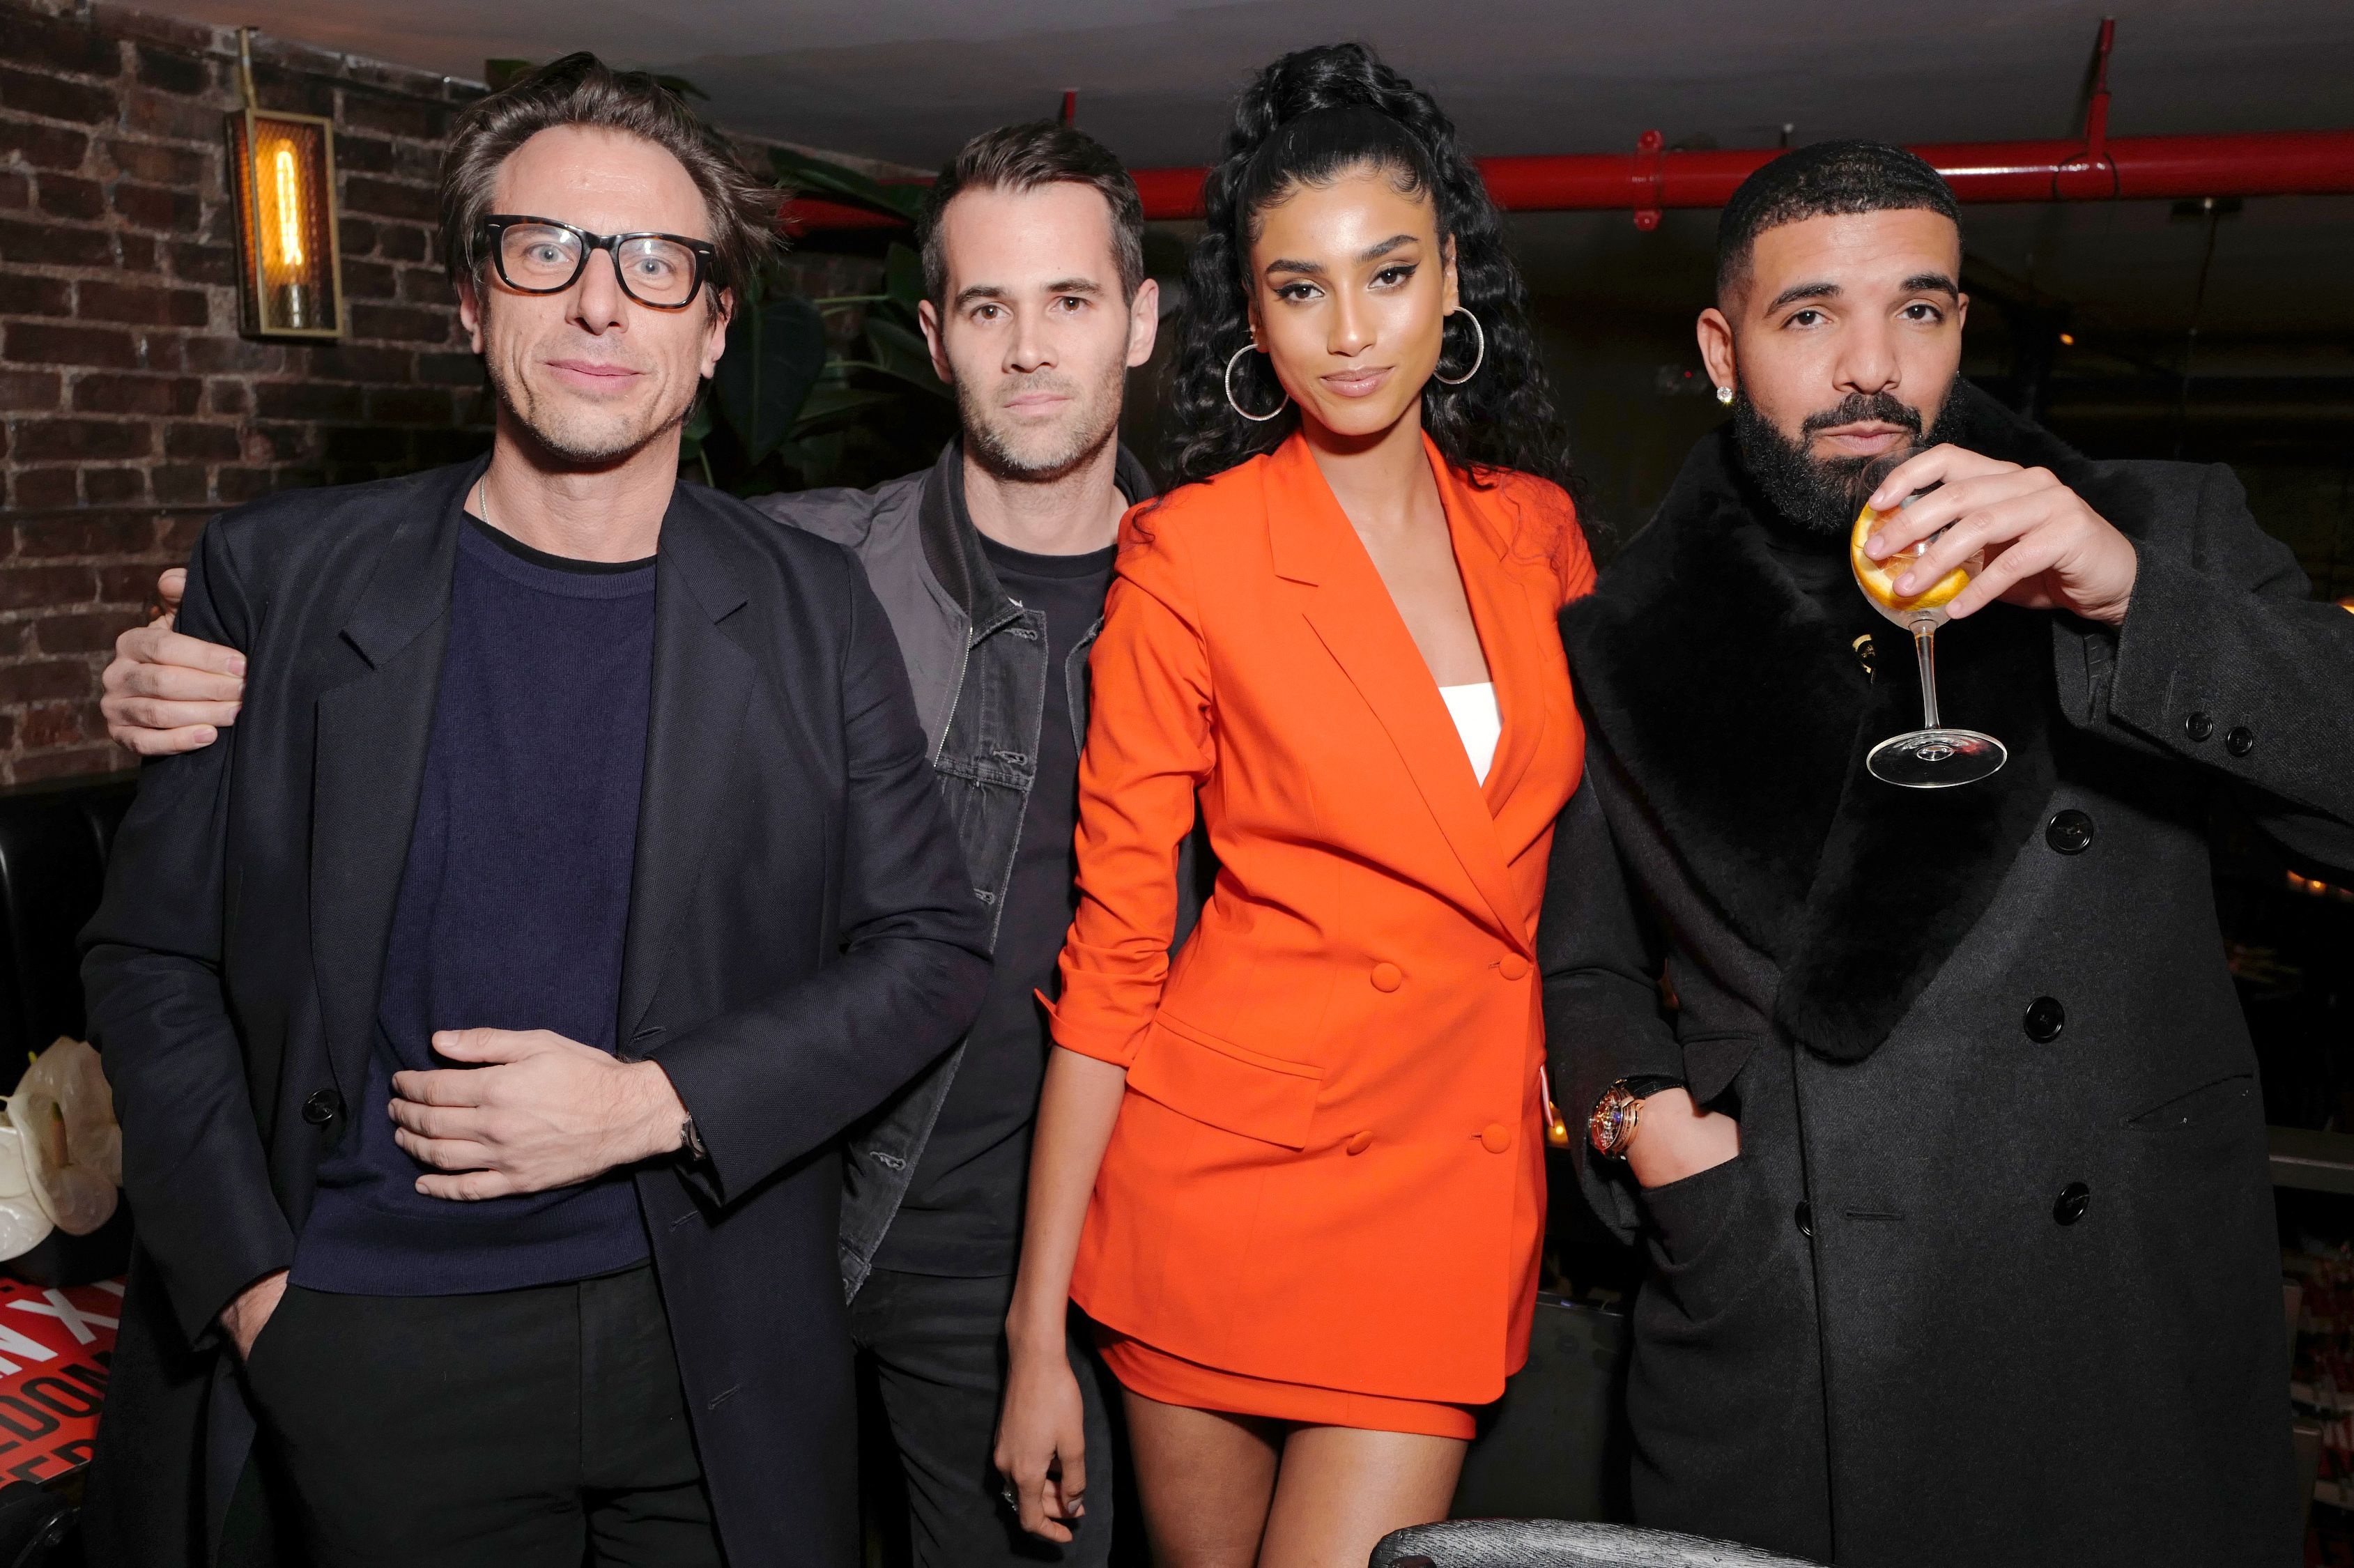 Erik Torstensson, Jens Grede, Imann Hammam and DrakeFrame x Imaan Dinner, Fall Winter 2020, New York Fashion Week, USA - 07 Feb 2020